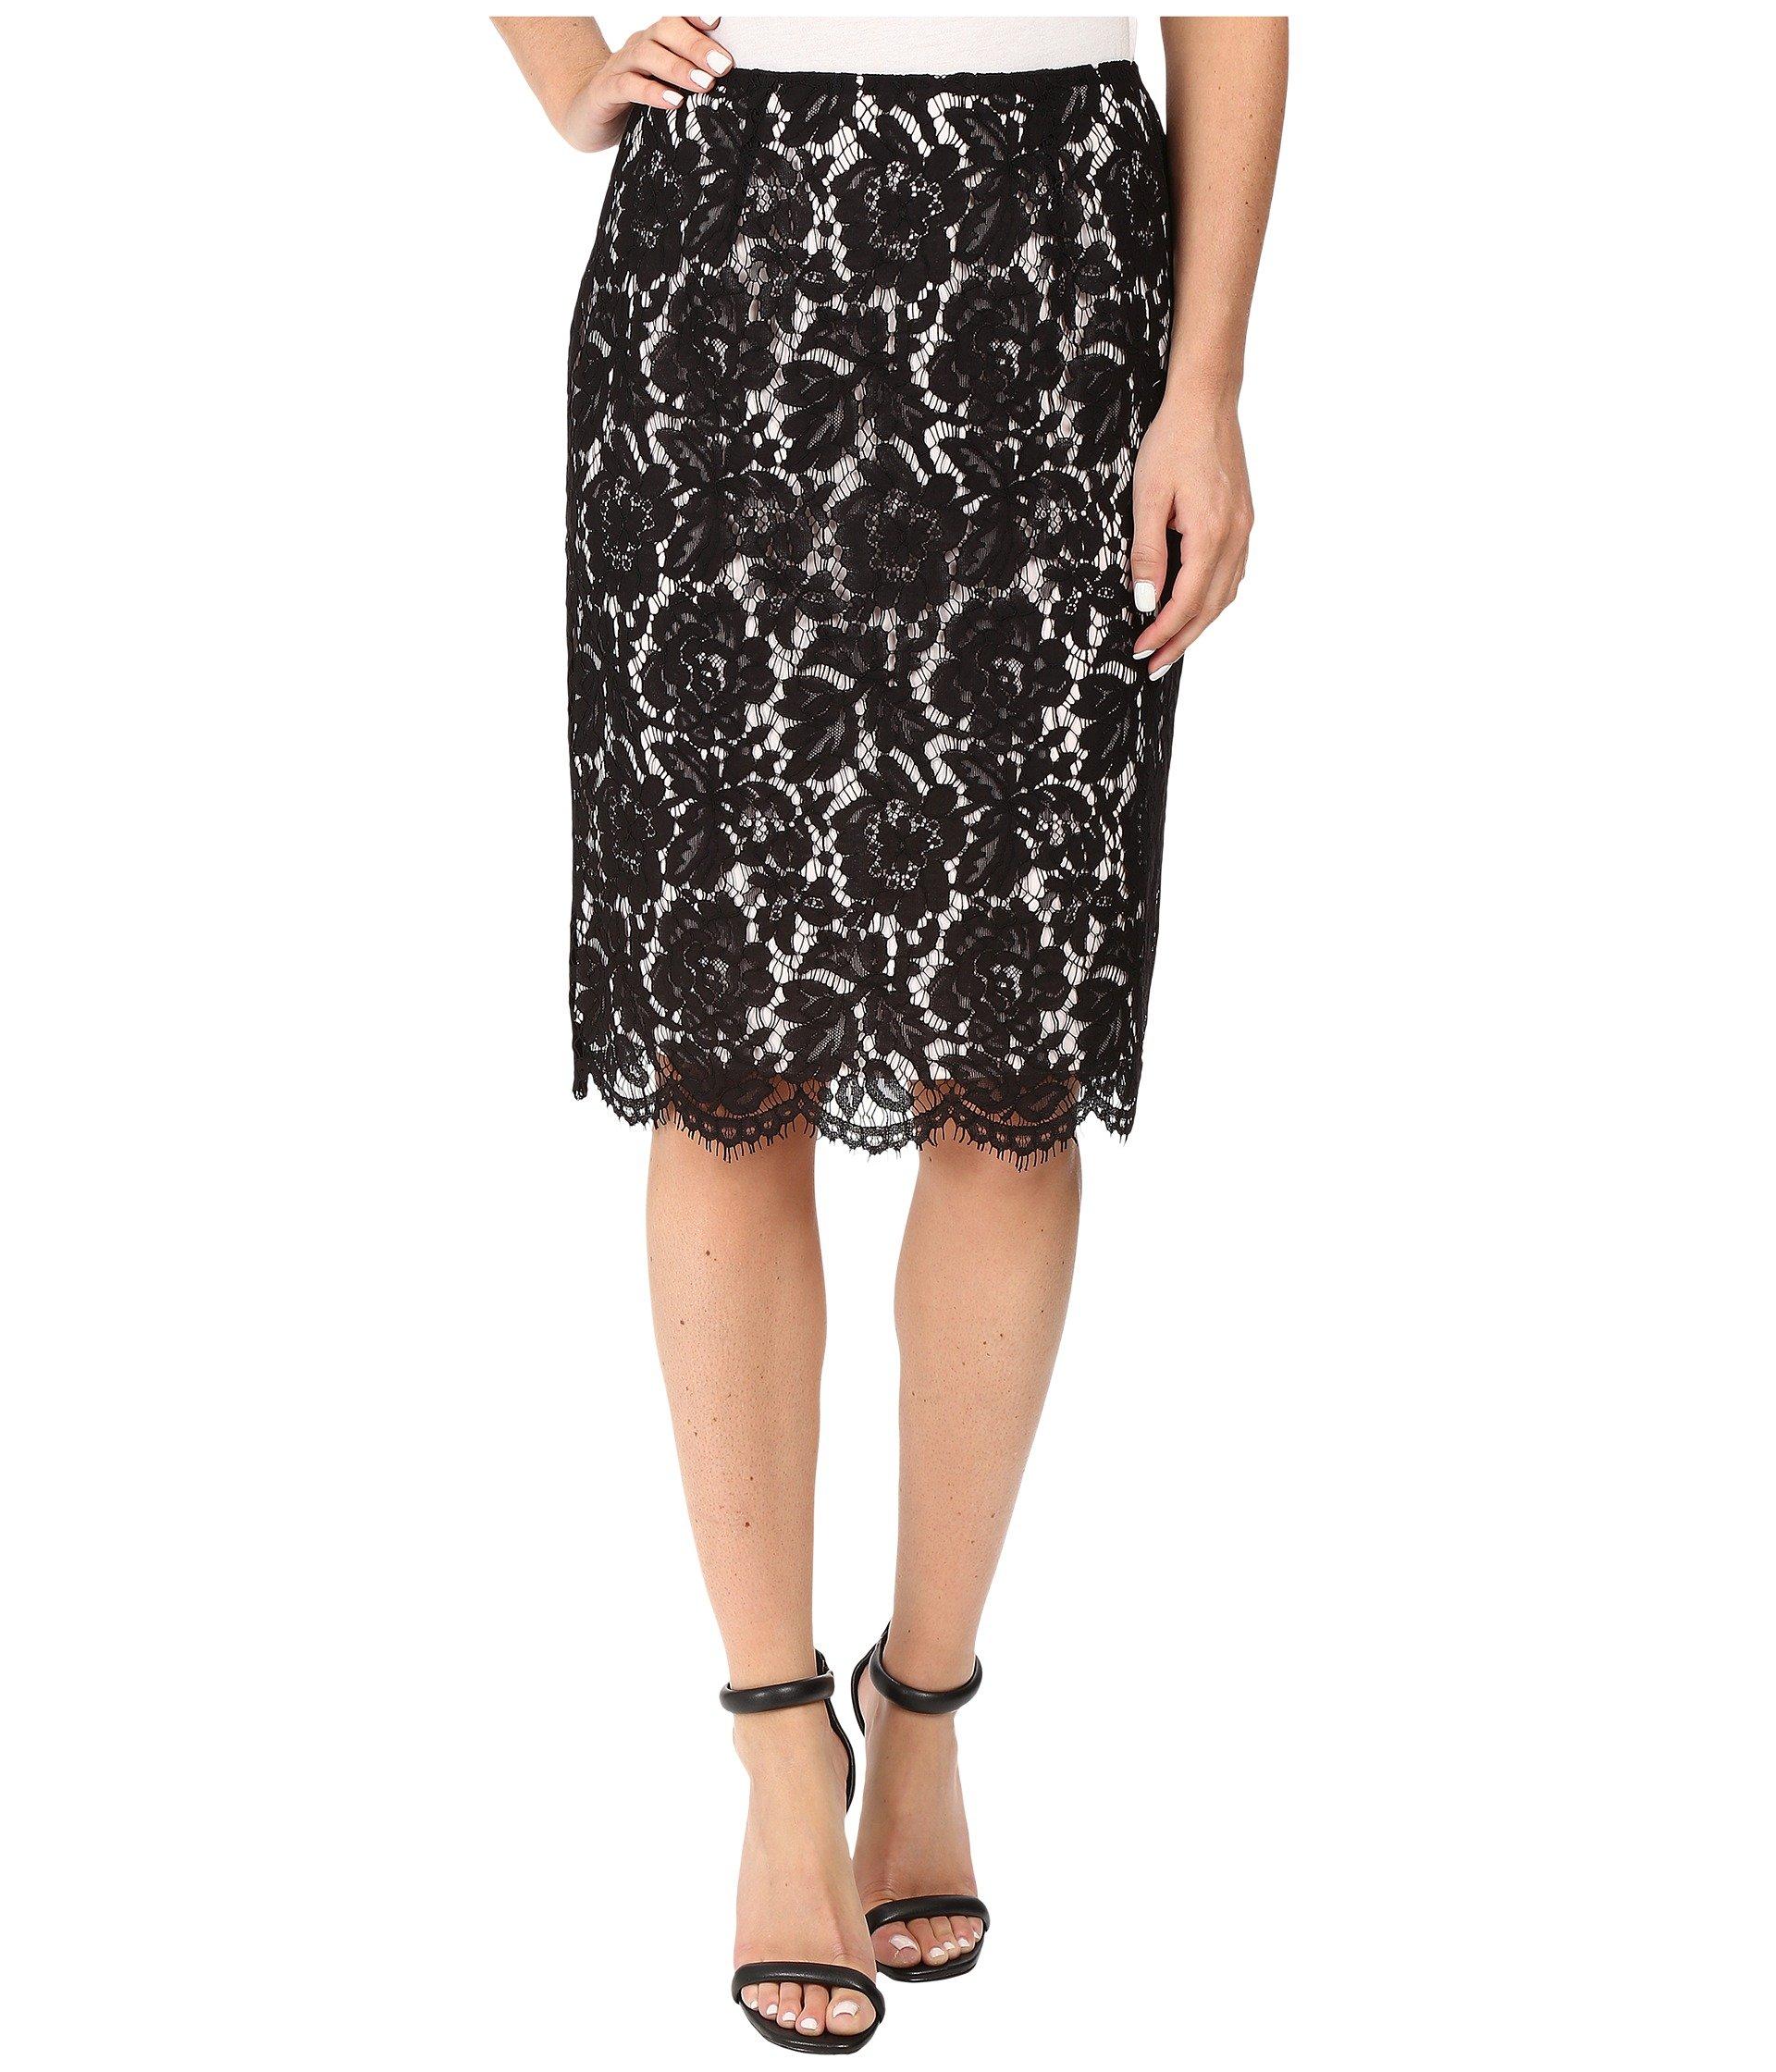 Falda para Mujer Vince Camuto Scallop Lace Pencil Skirt  + Vince Camuto en VeoyCompro.net